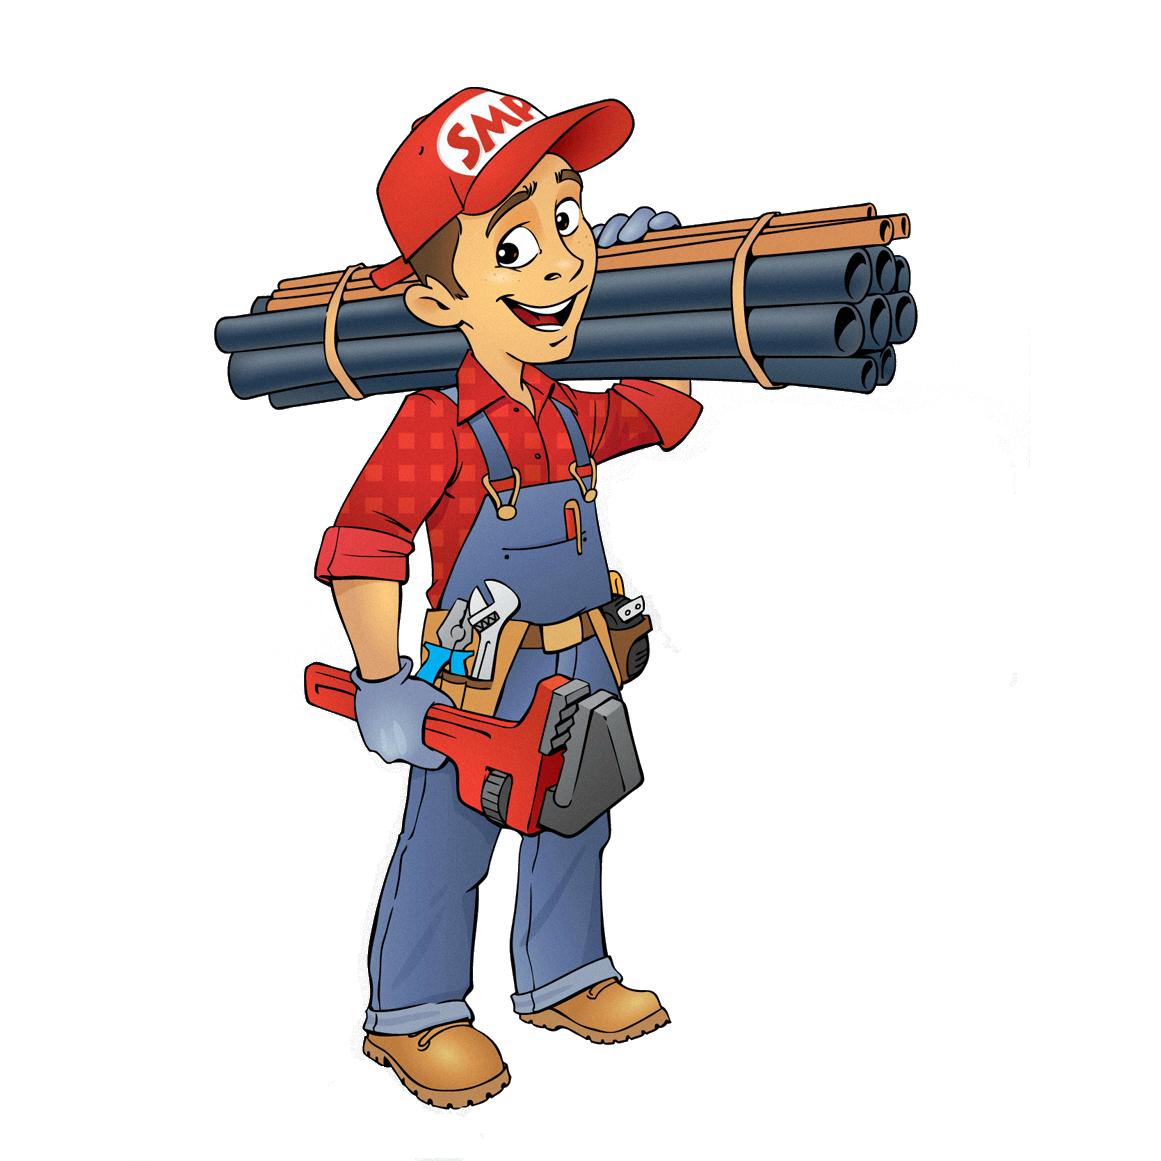 Super Mario Plumbing